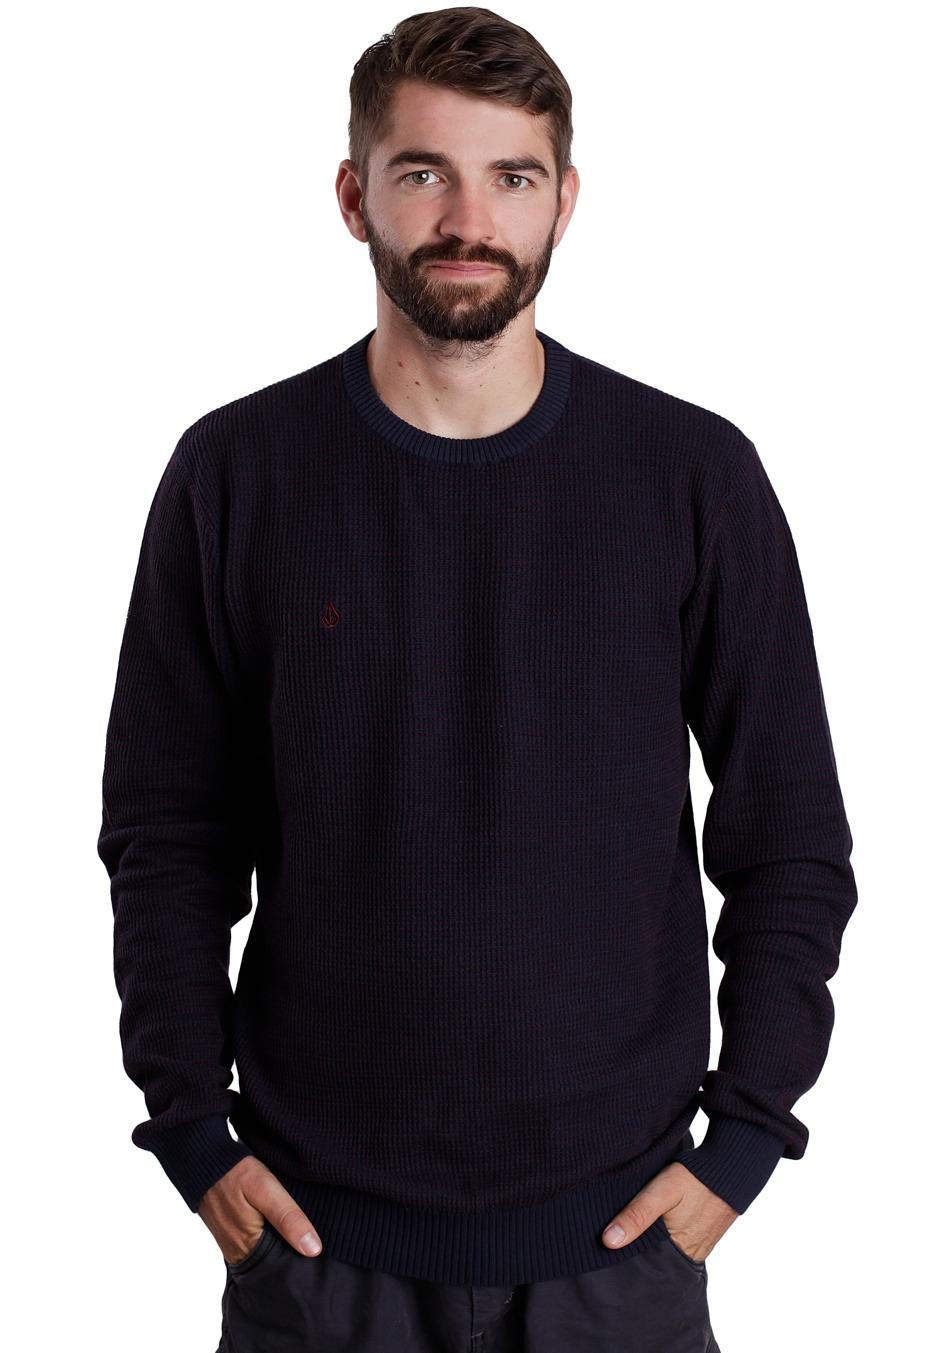 Volcom - Brouhaha Dark Navy - Pullover - Streetwear Shop ...